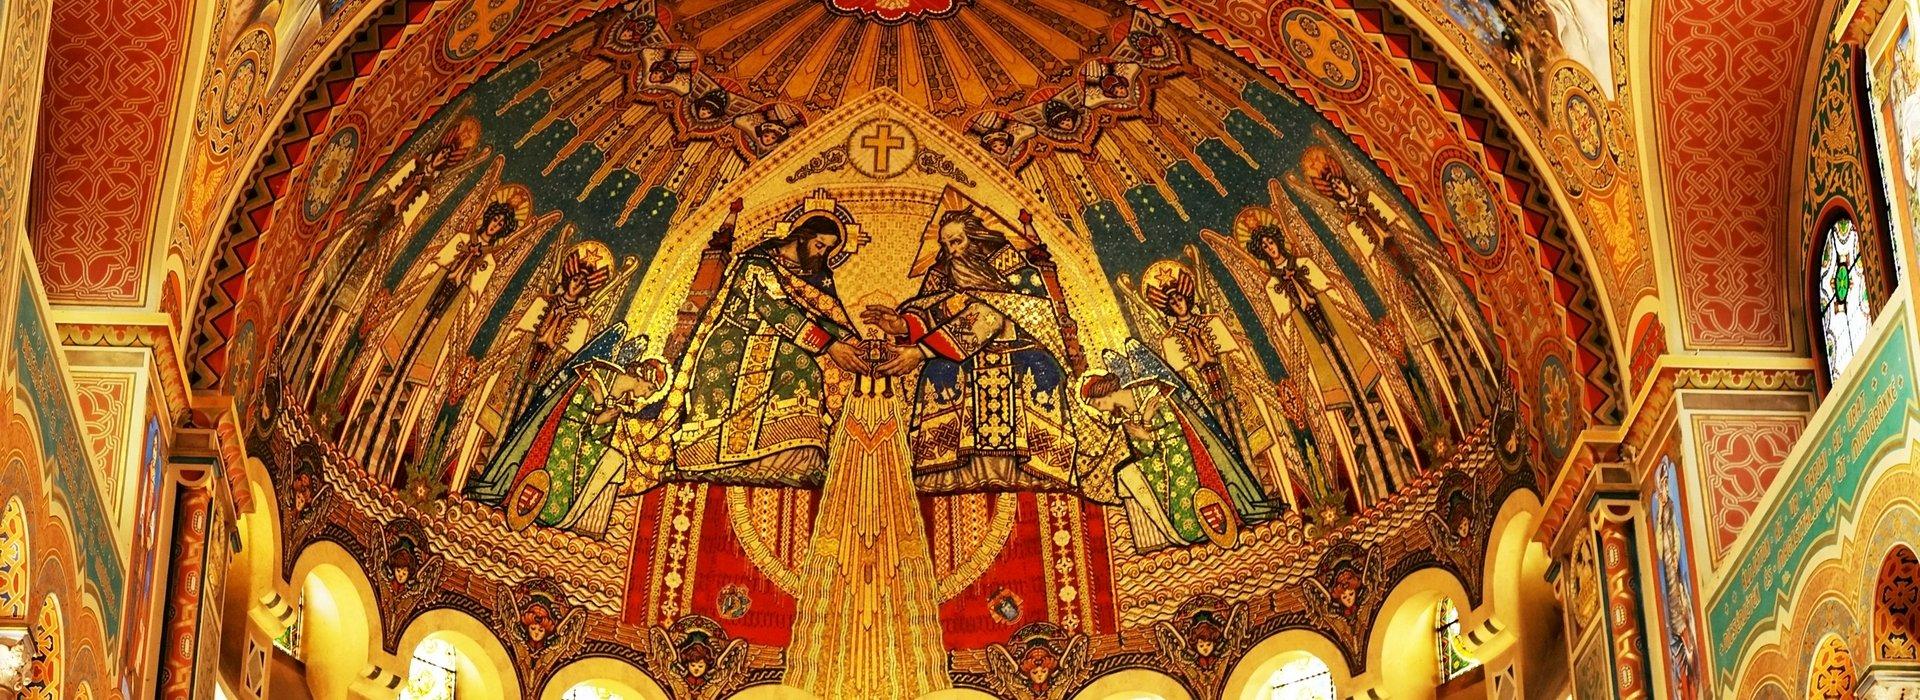 Szeged Culture – Cultural life of Szeged